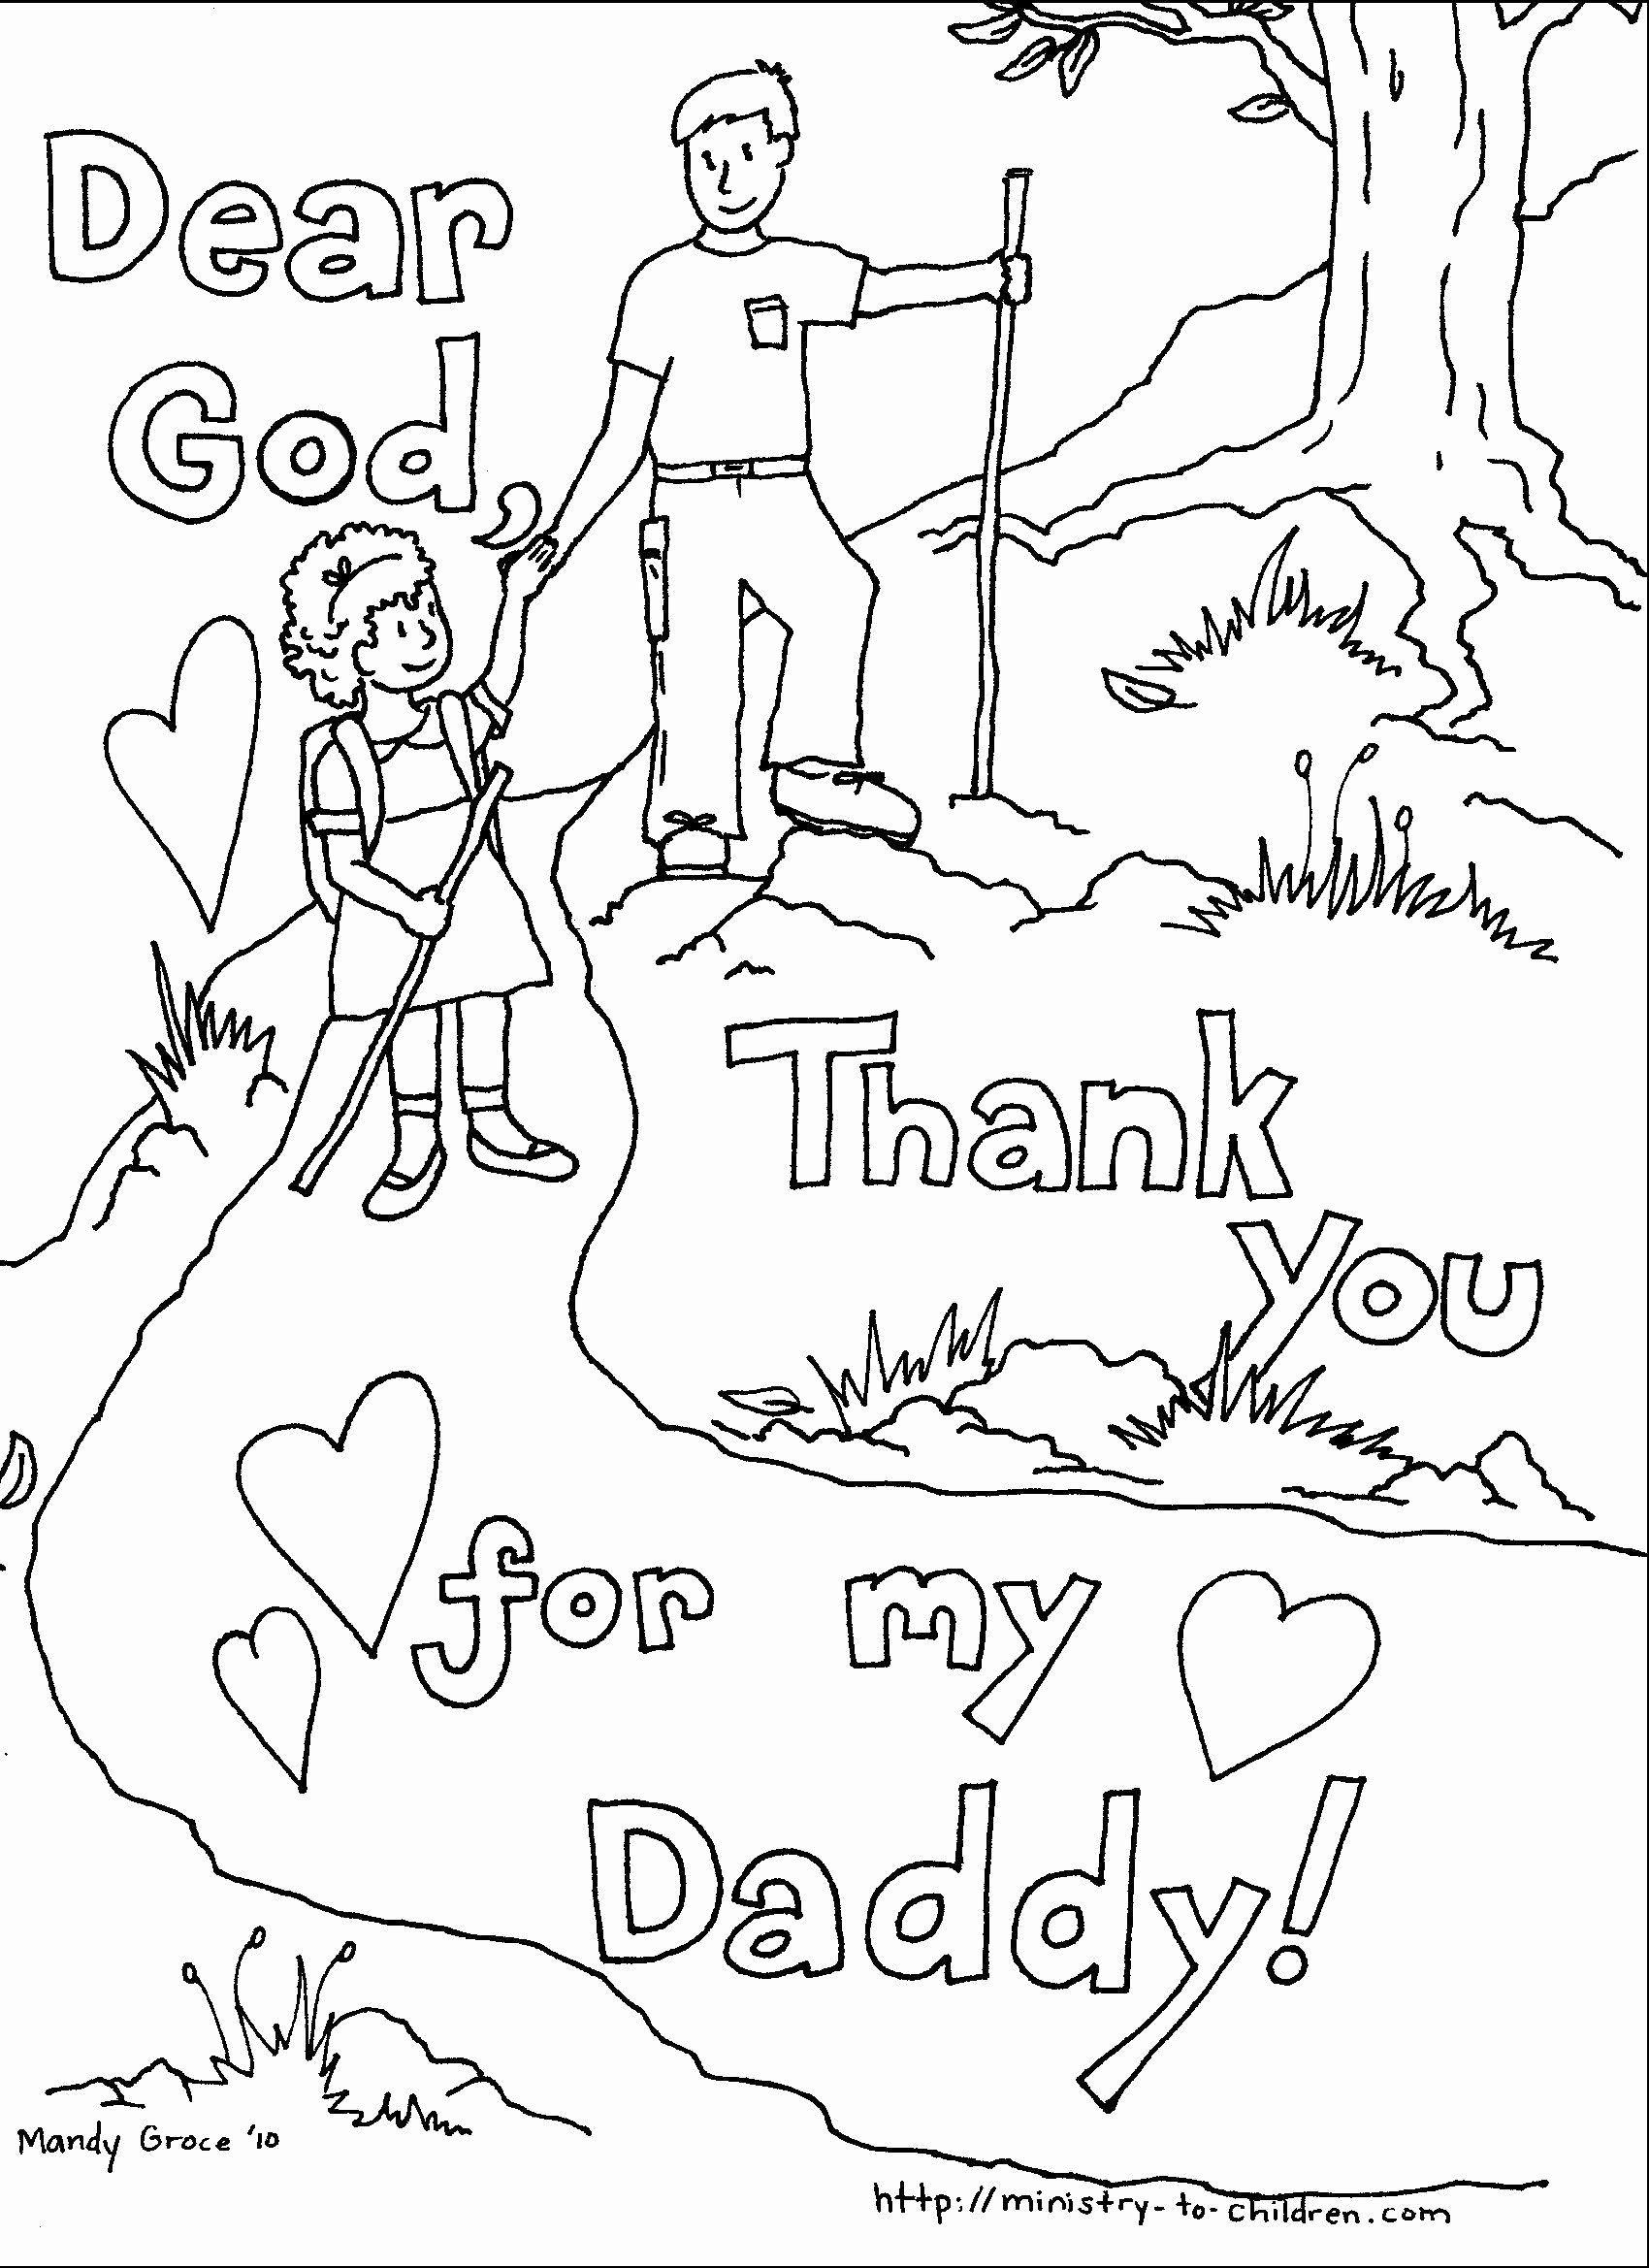 Easter Egg Hunt Coloring Page Beautiful Fresh Easter Jesus Coloring Sheets Tintuc247 Gambar